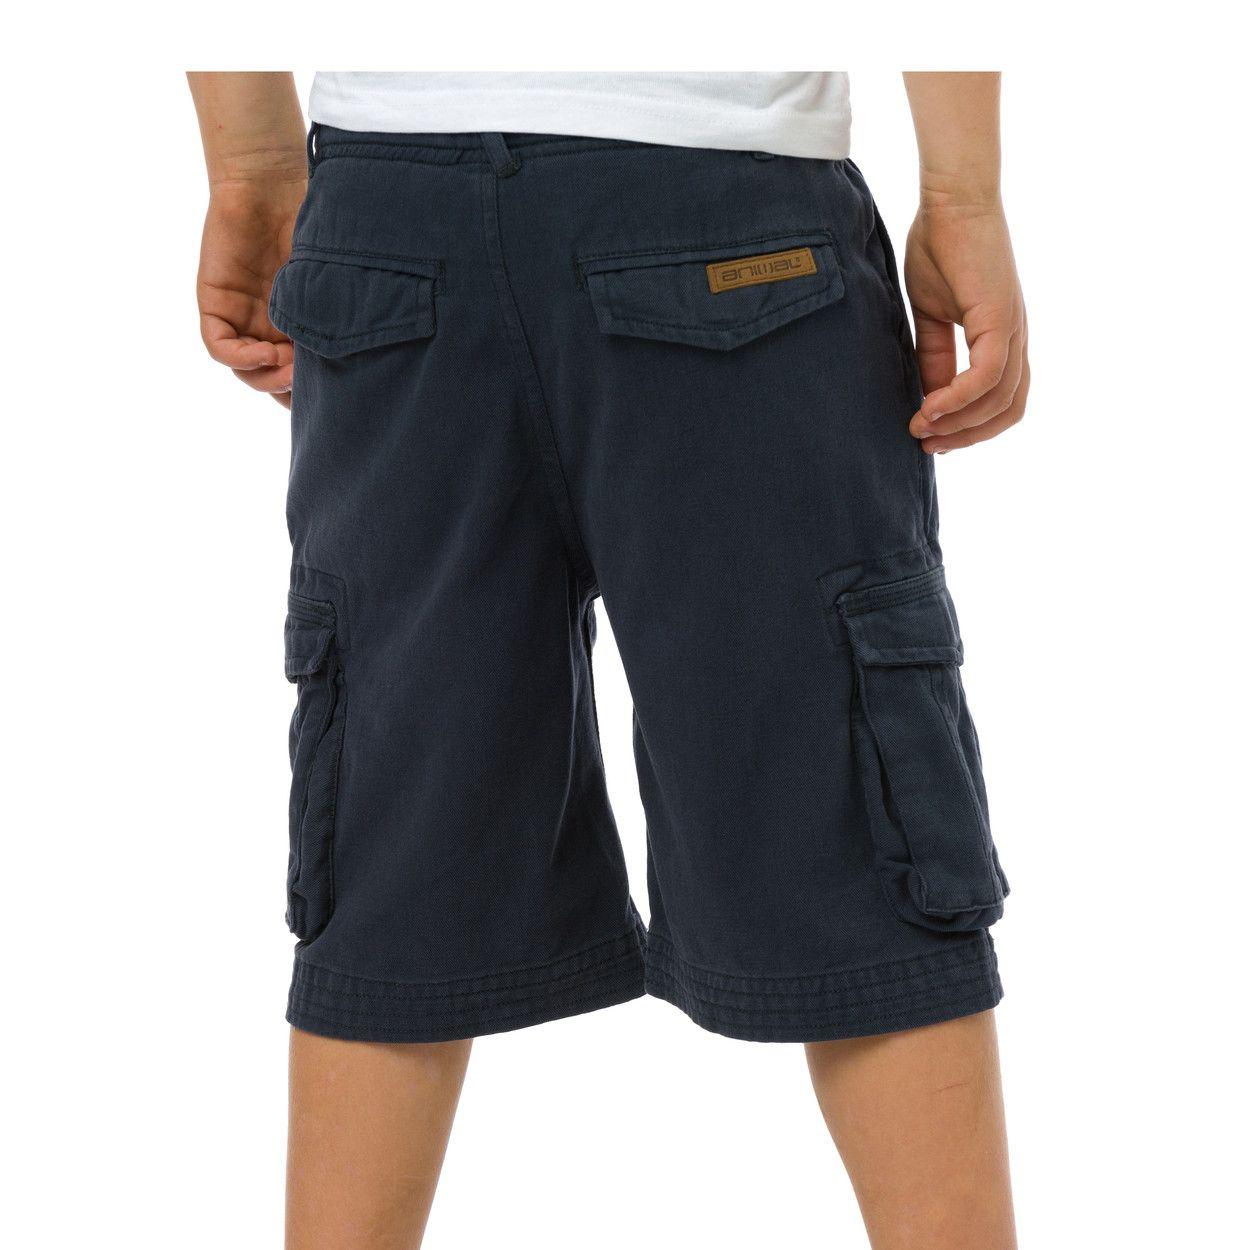 Animal Boys Antony Printed Brand Cargo Shorts CL5SG646 Navy